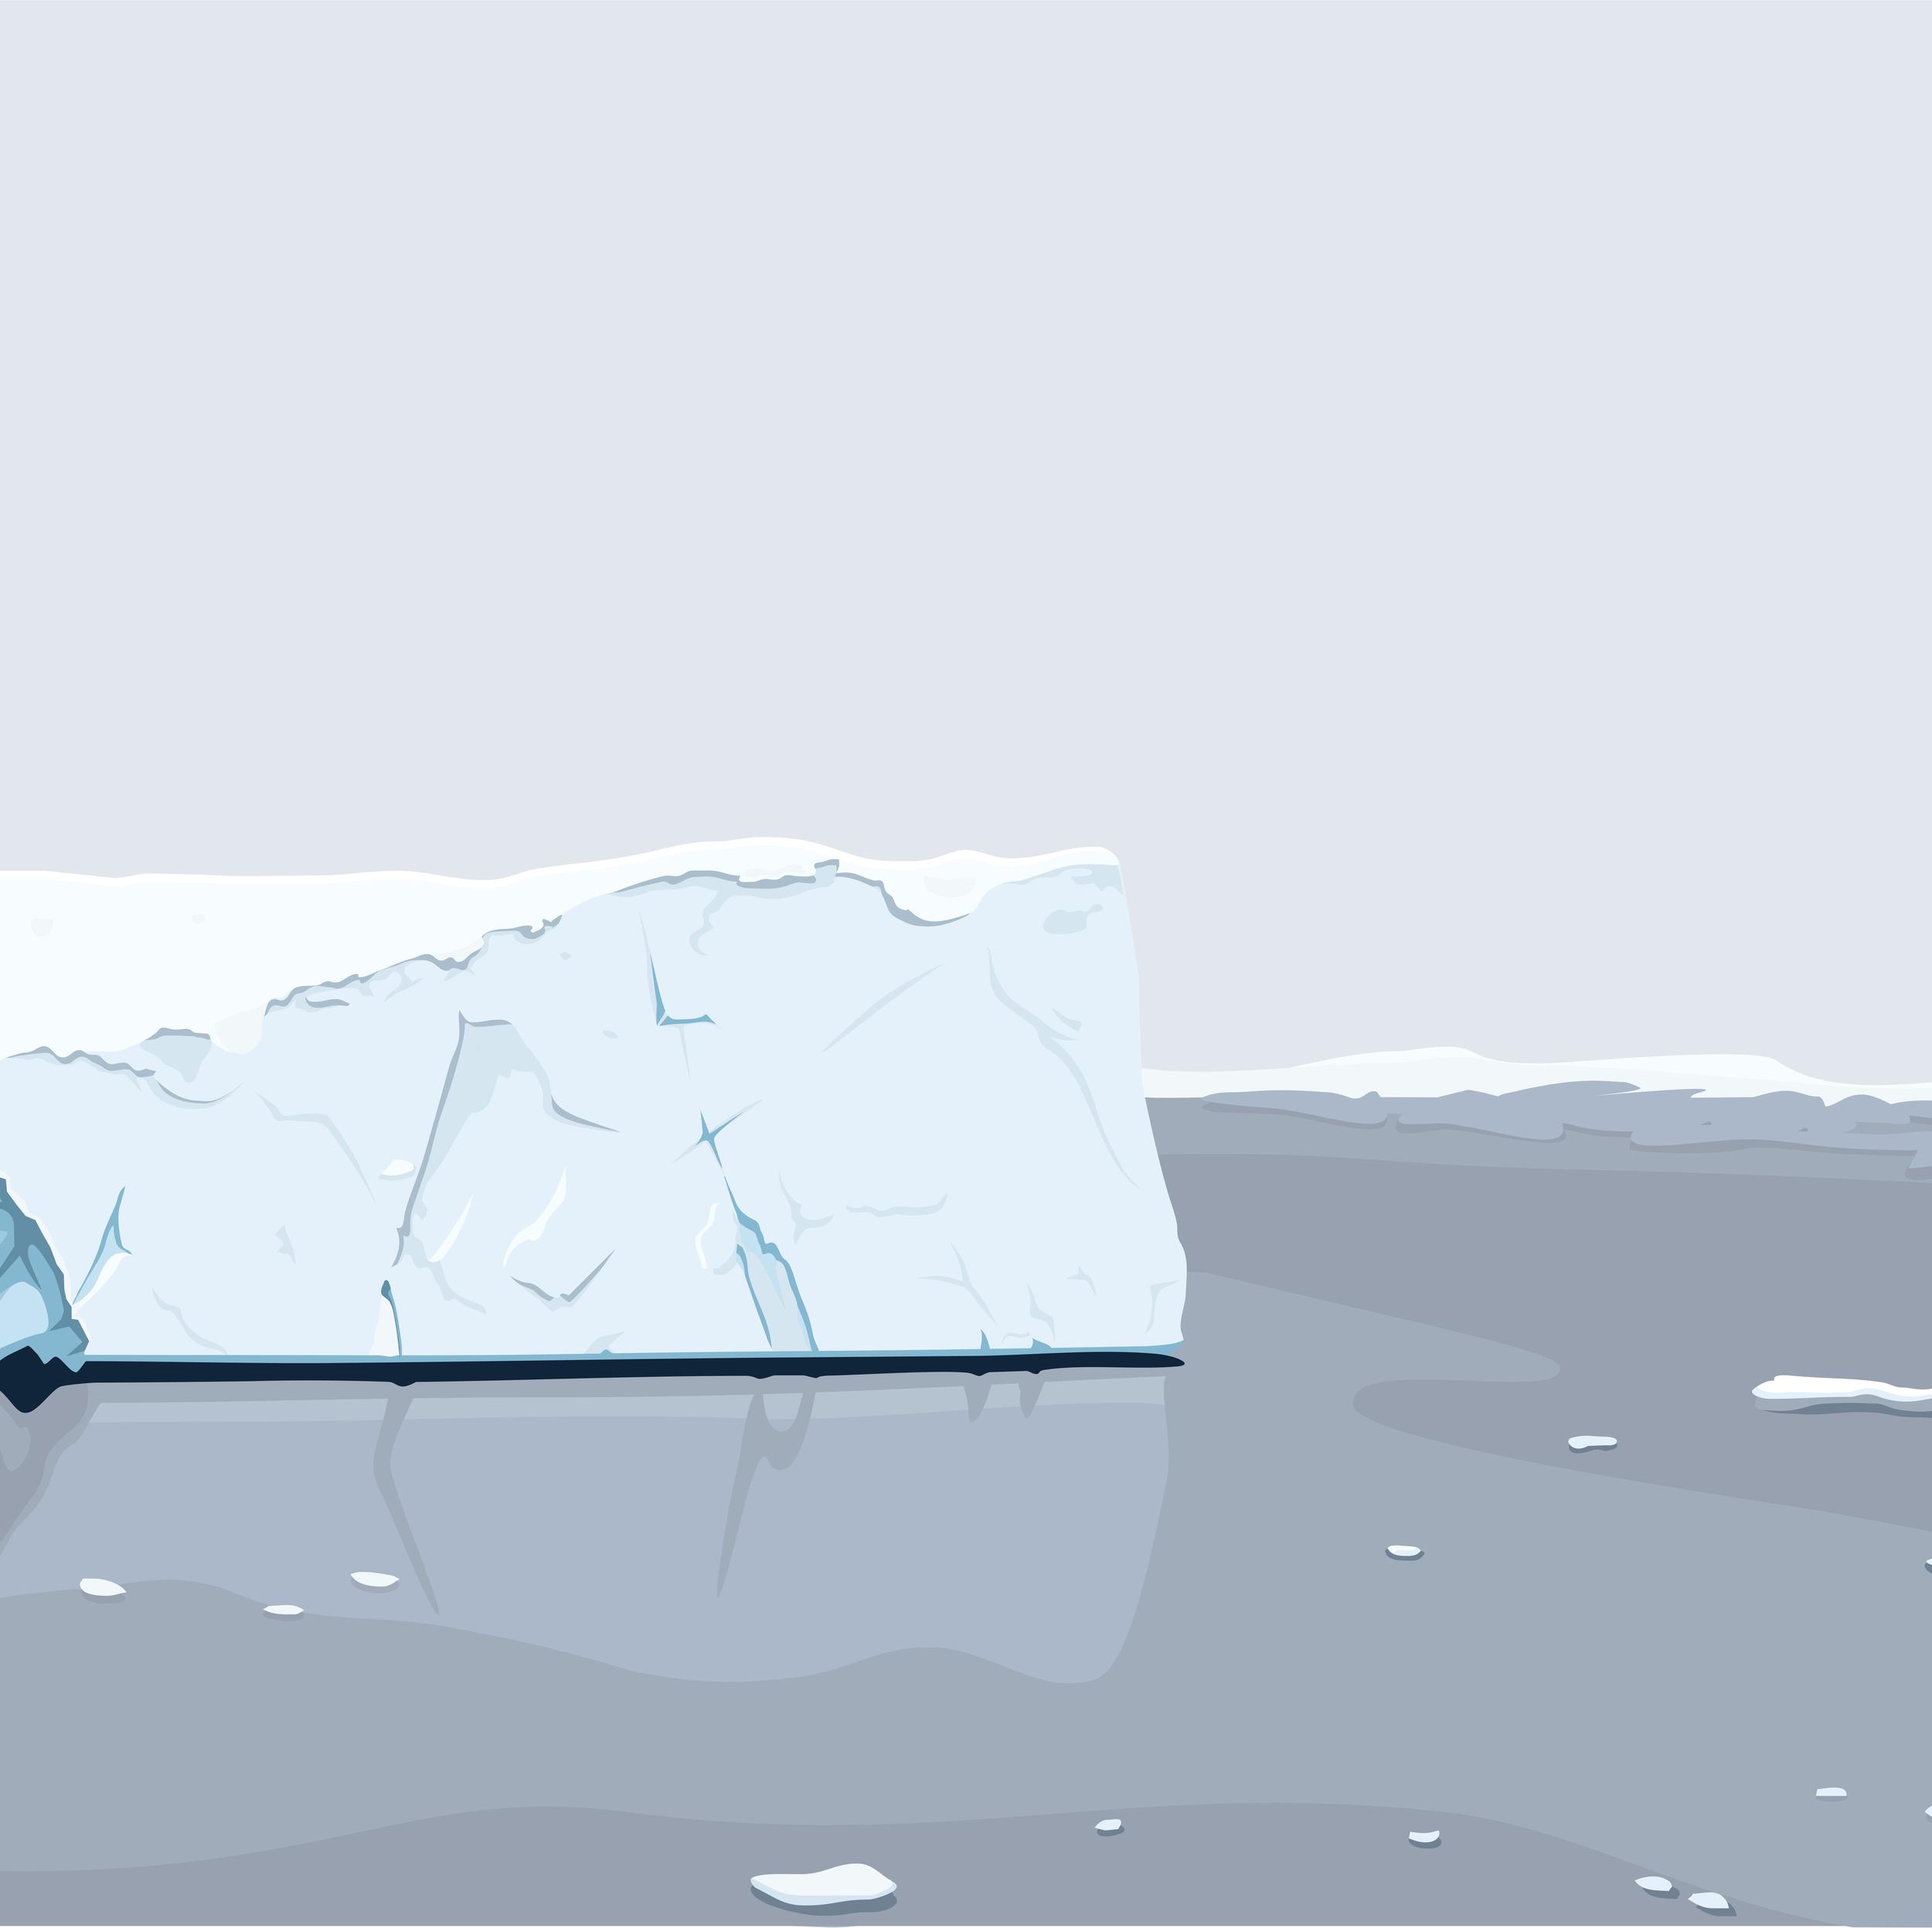 EXP_28 LAY ICESCAPE_Universal_Fogra.jpg